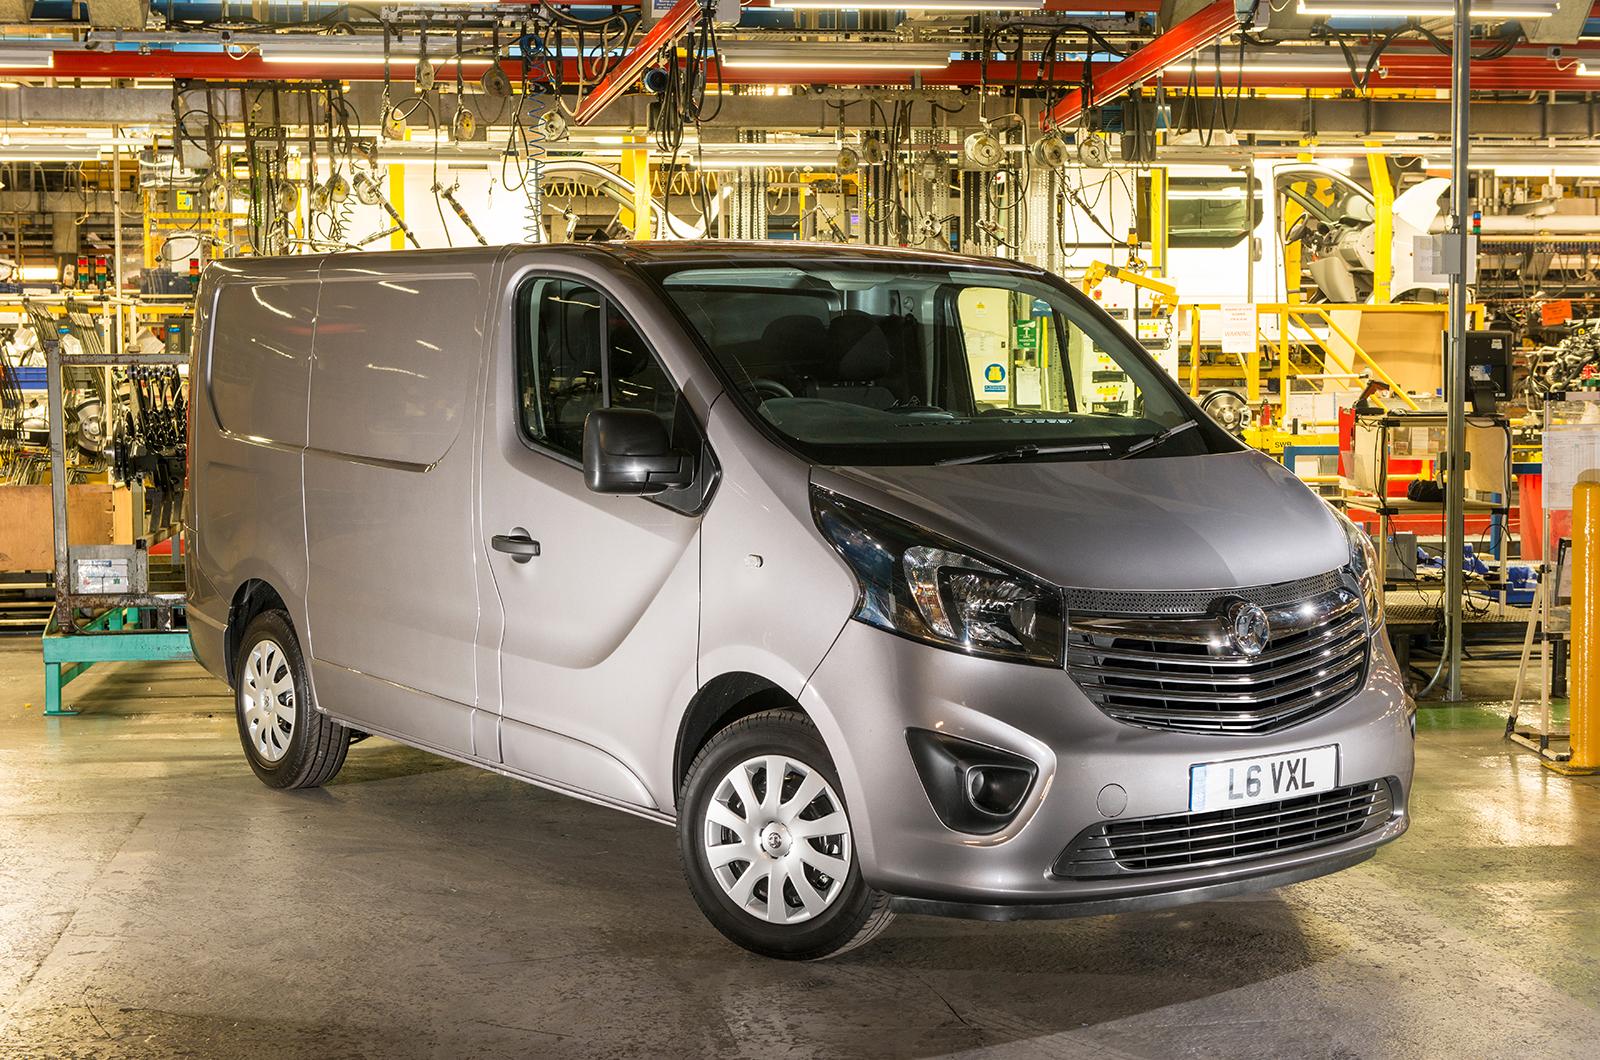 2014 [Renault/Opel/Fiat/Nissan] Trafic/Vivaro/Talento/NV300 - Page 4 Vauxhall-van-46